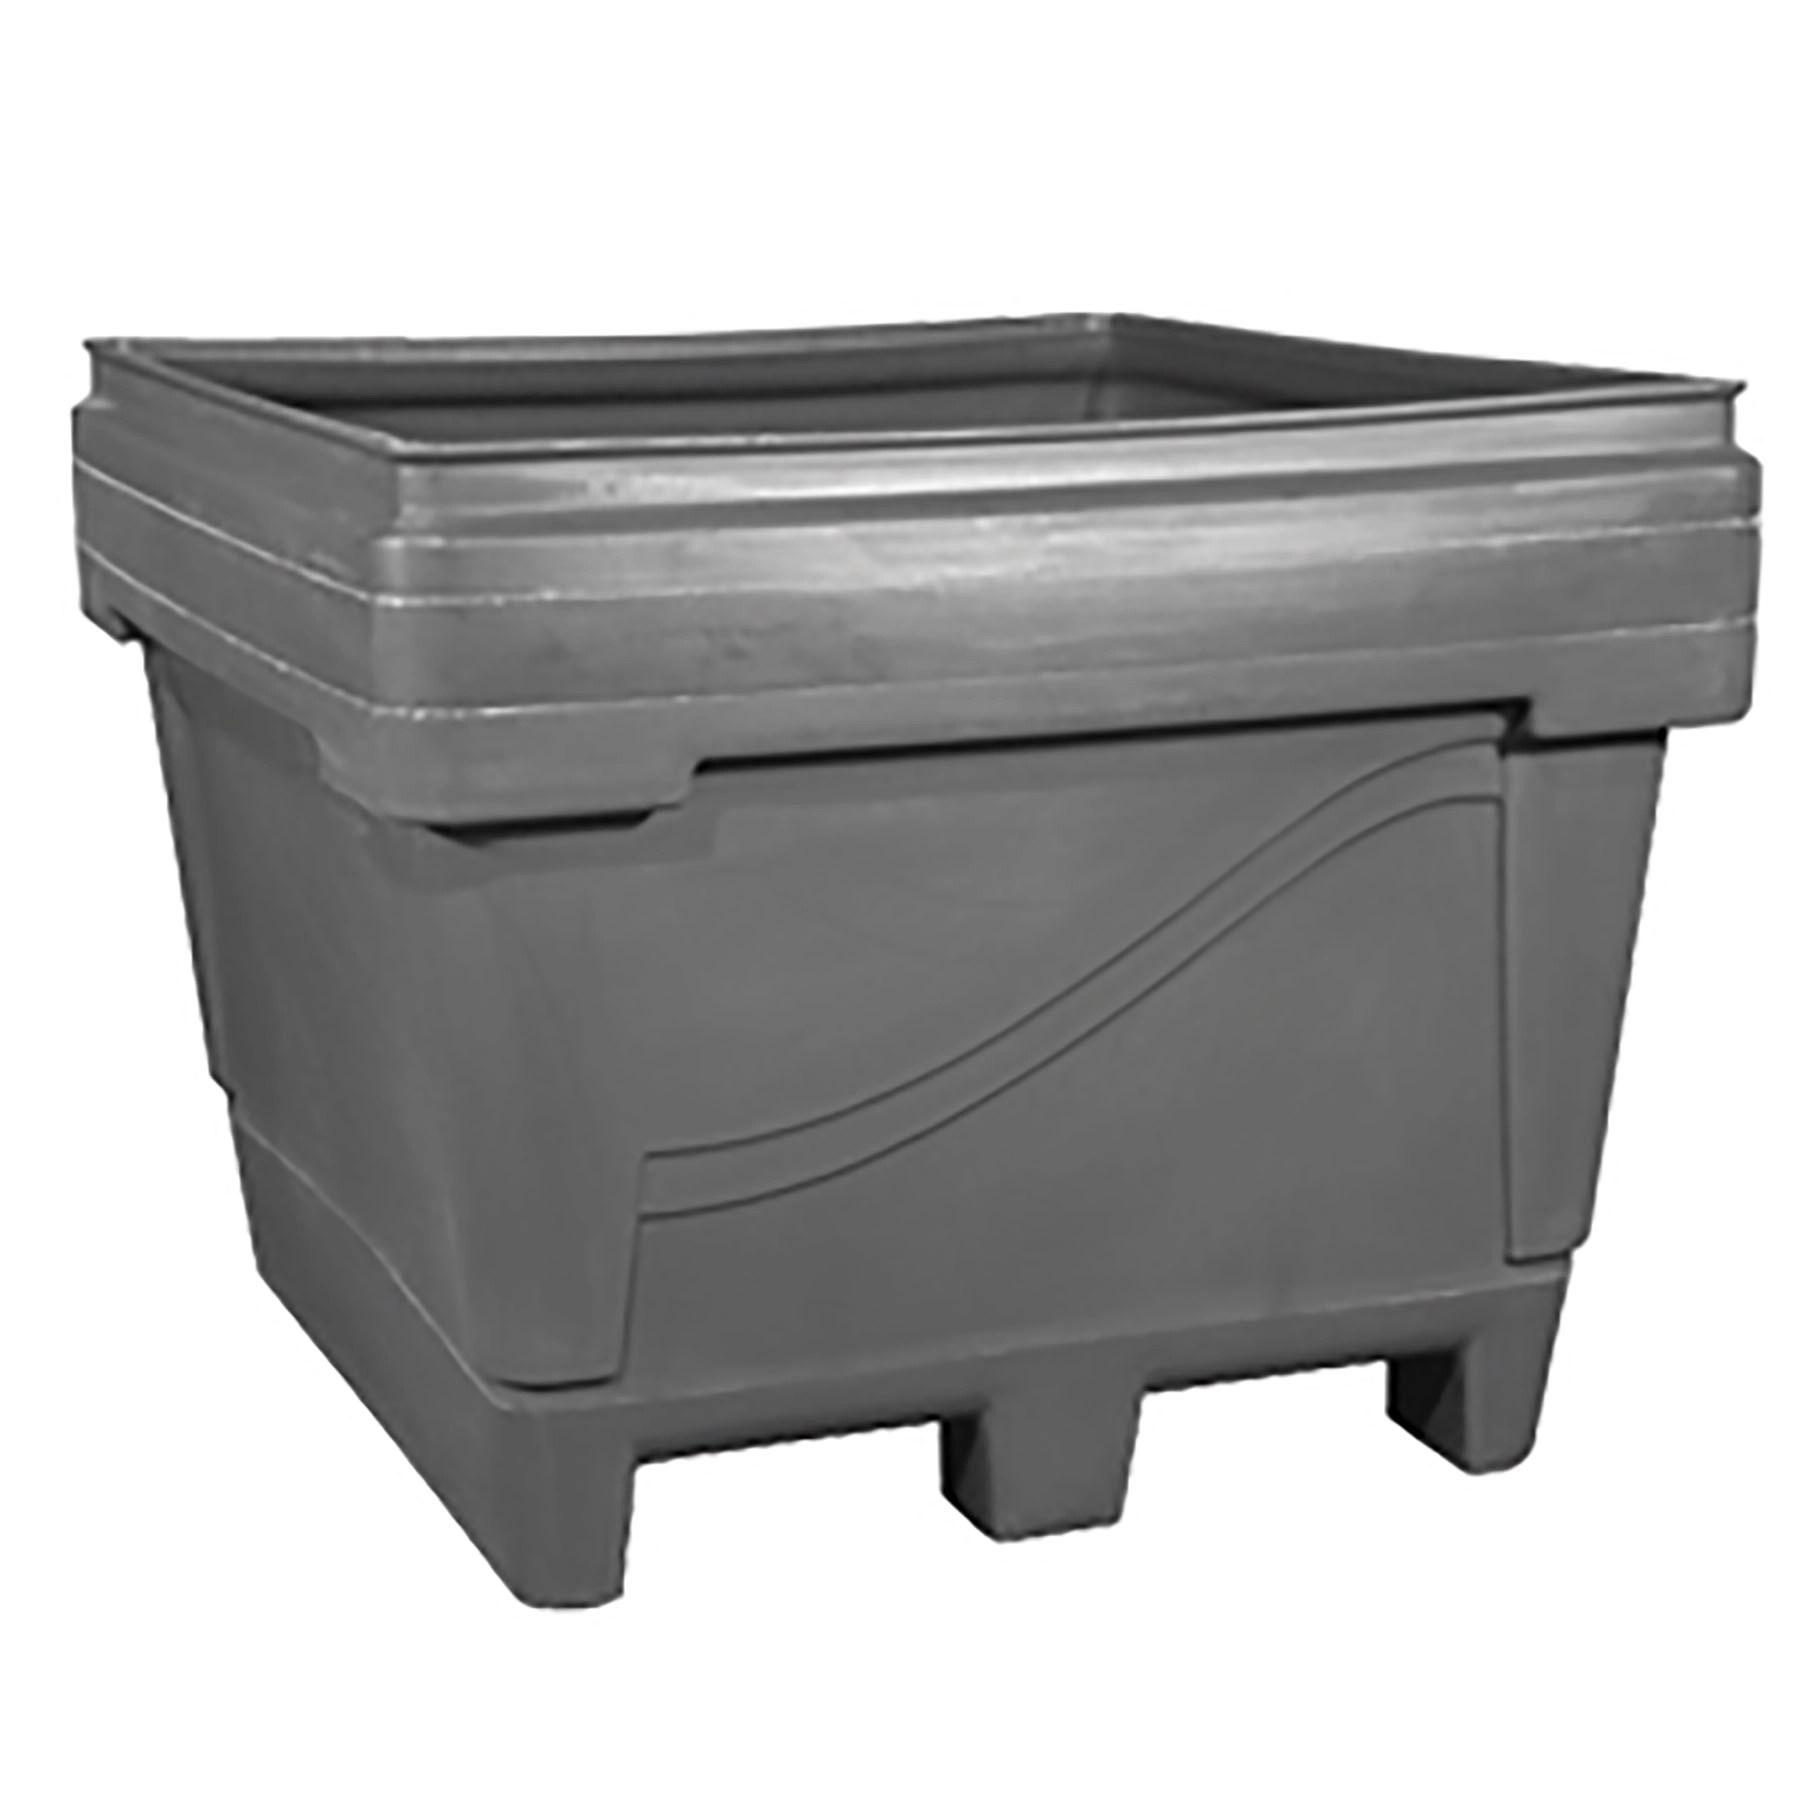 hight resolution of heavy duty bins